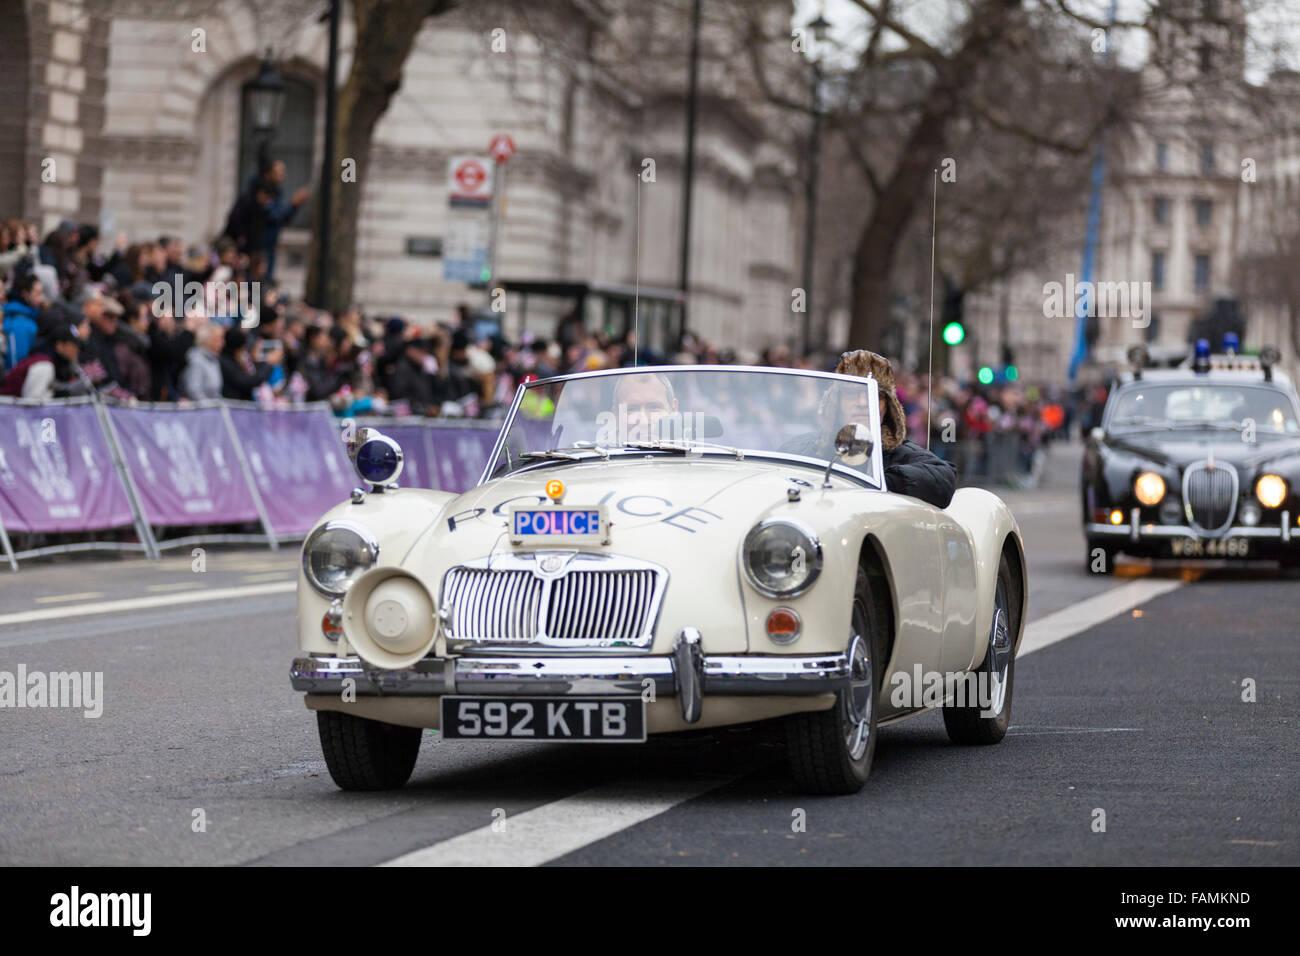 London Uk January Classic Cars From Police Car Uk